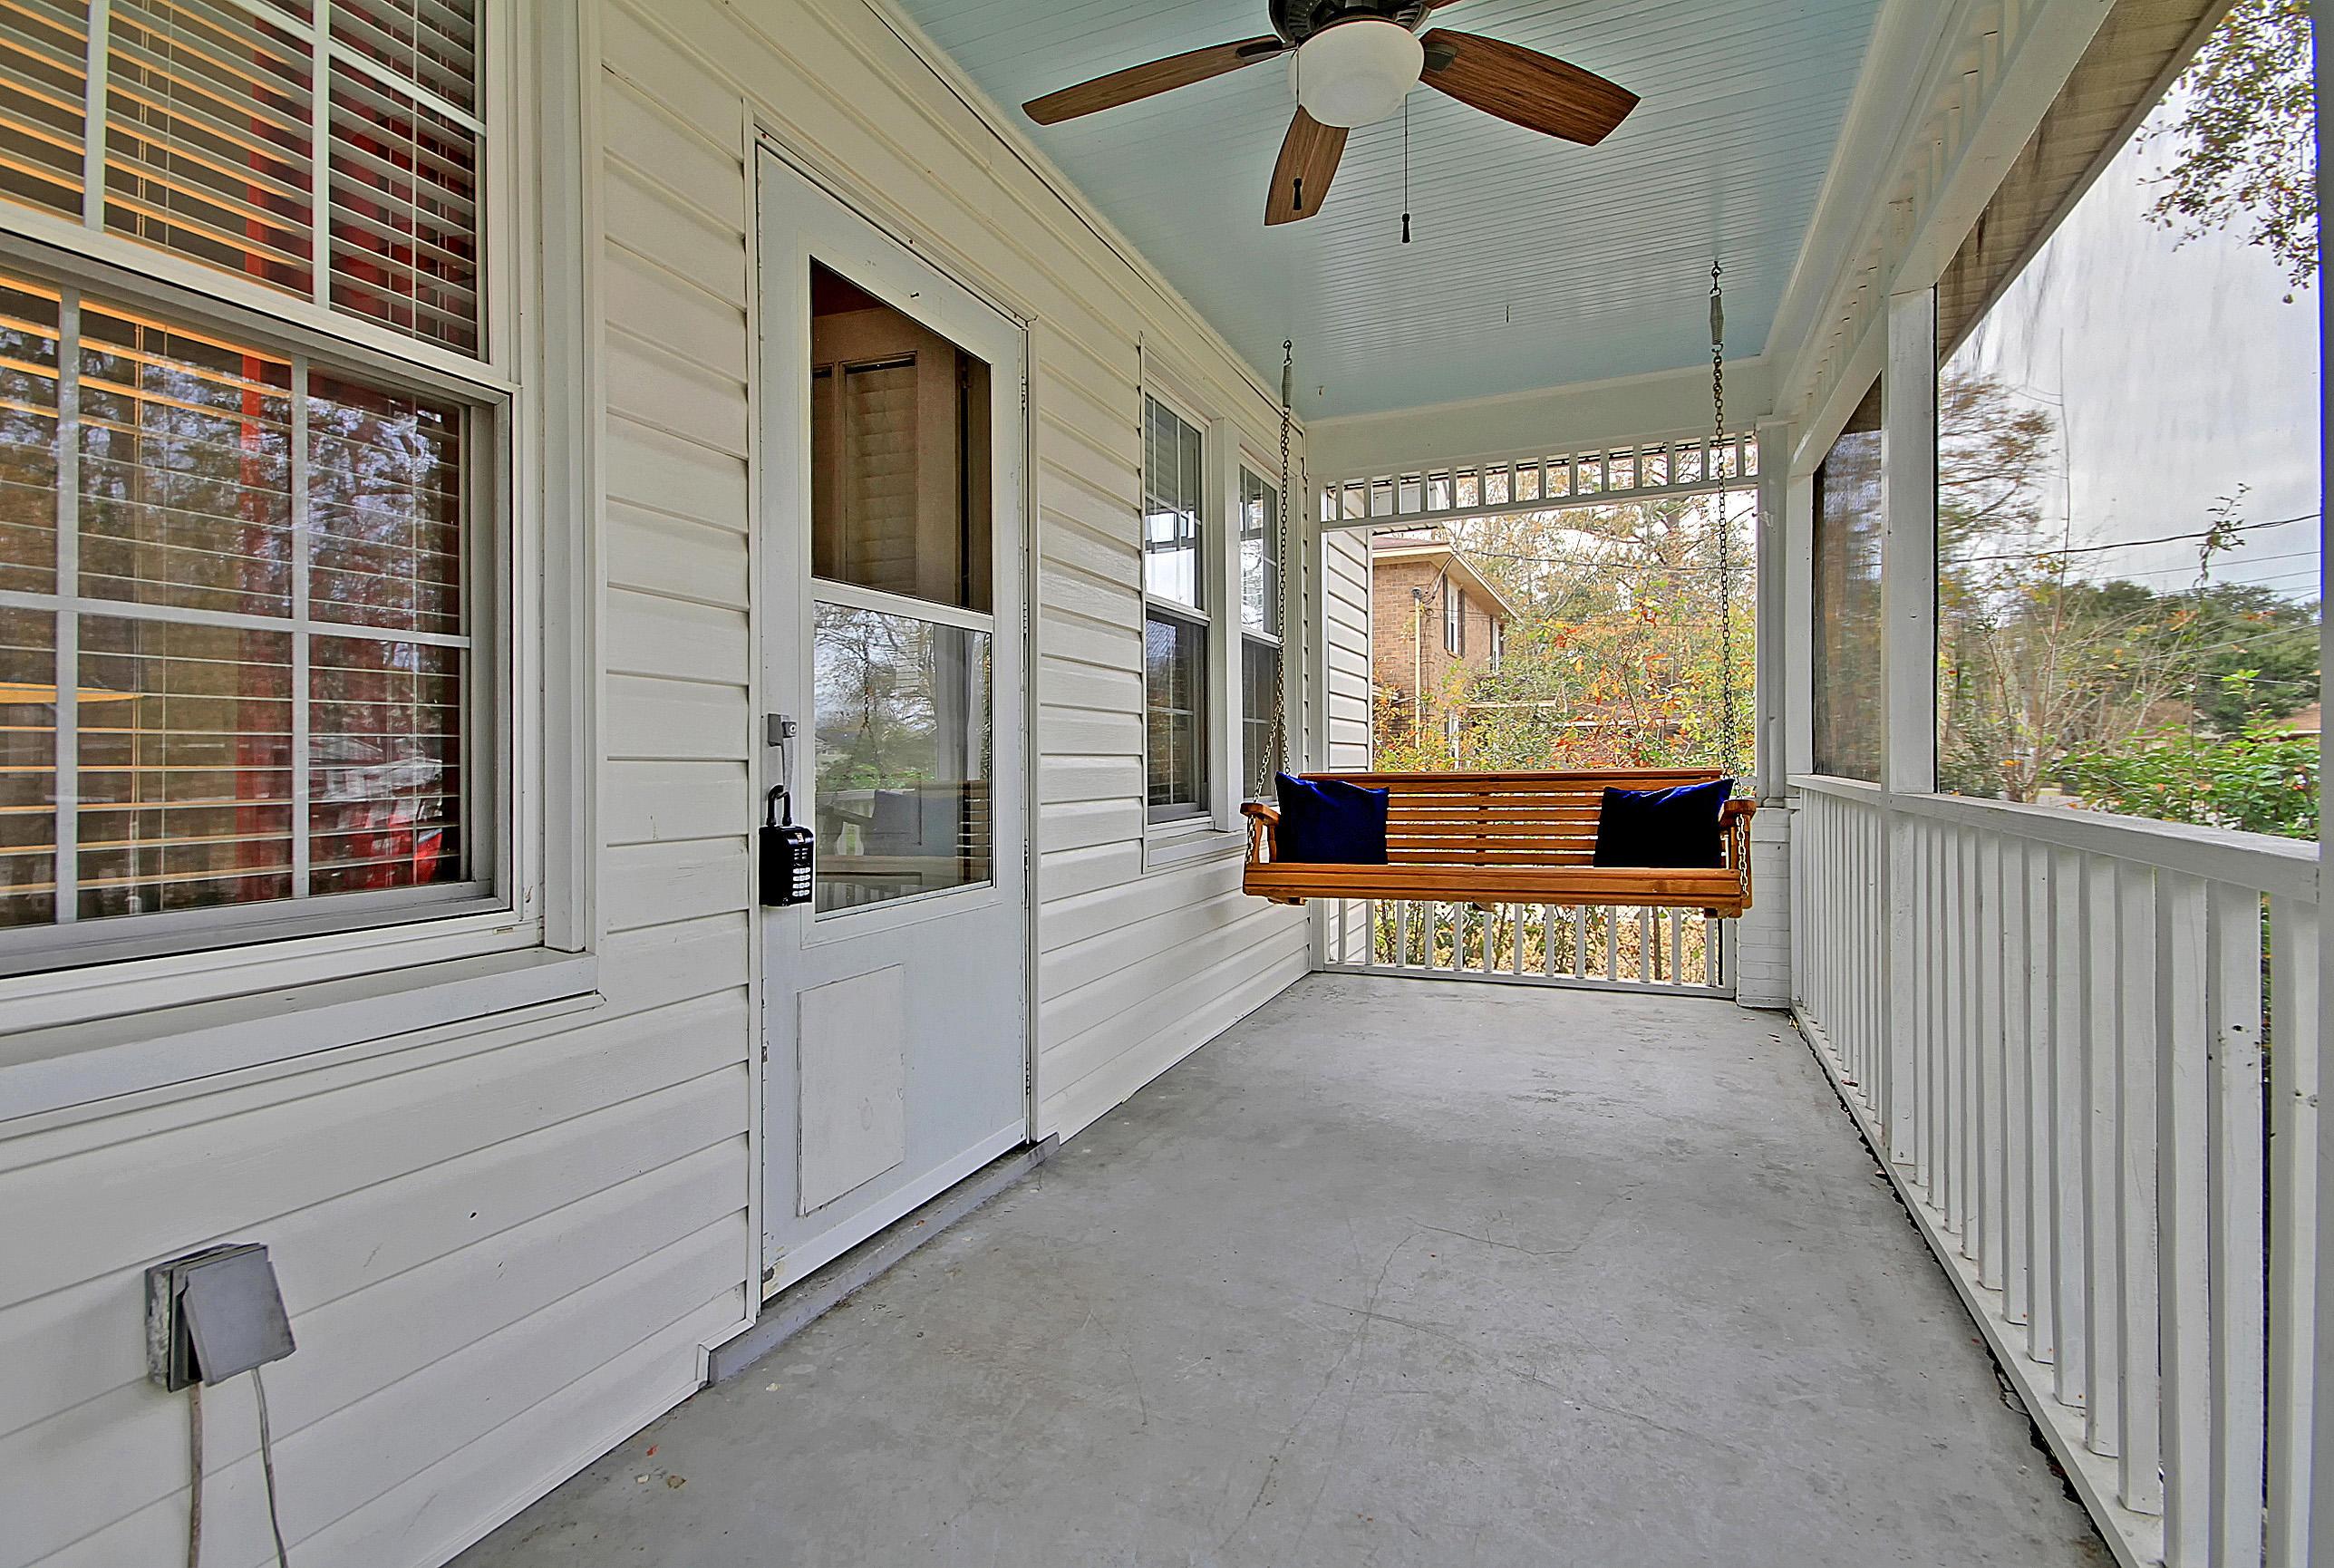 Pinecrest Gardens Homes For Sale - 1607 Pinecrest, Charleston, SC - 28